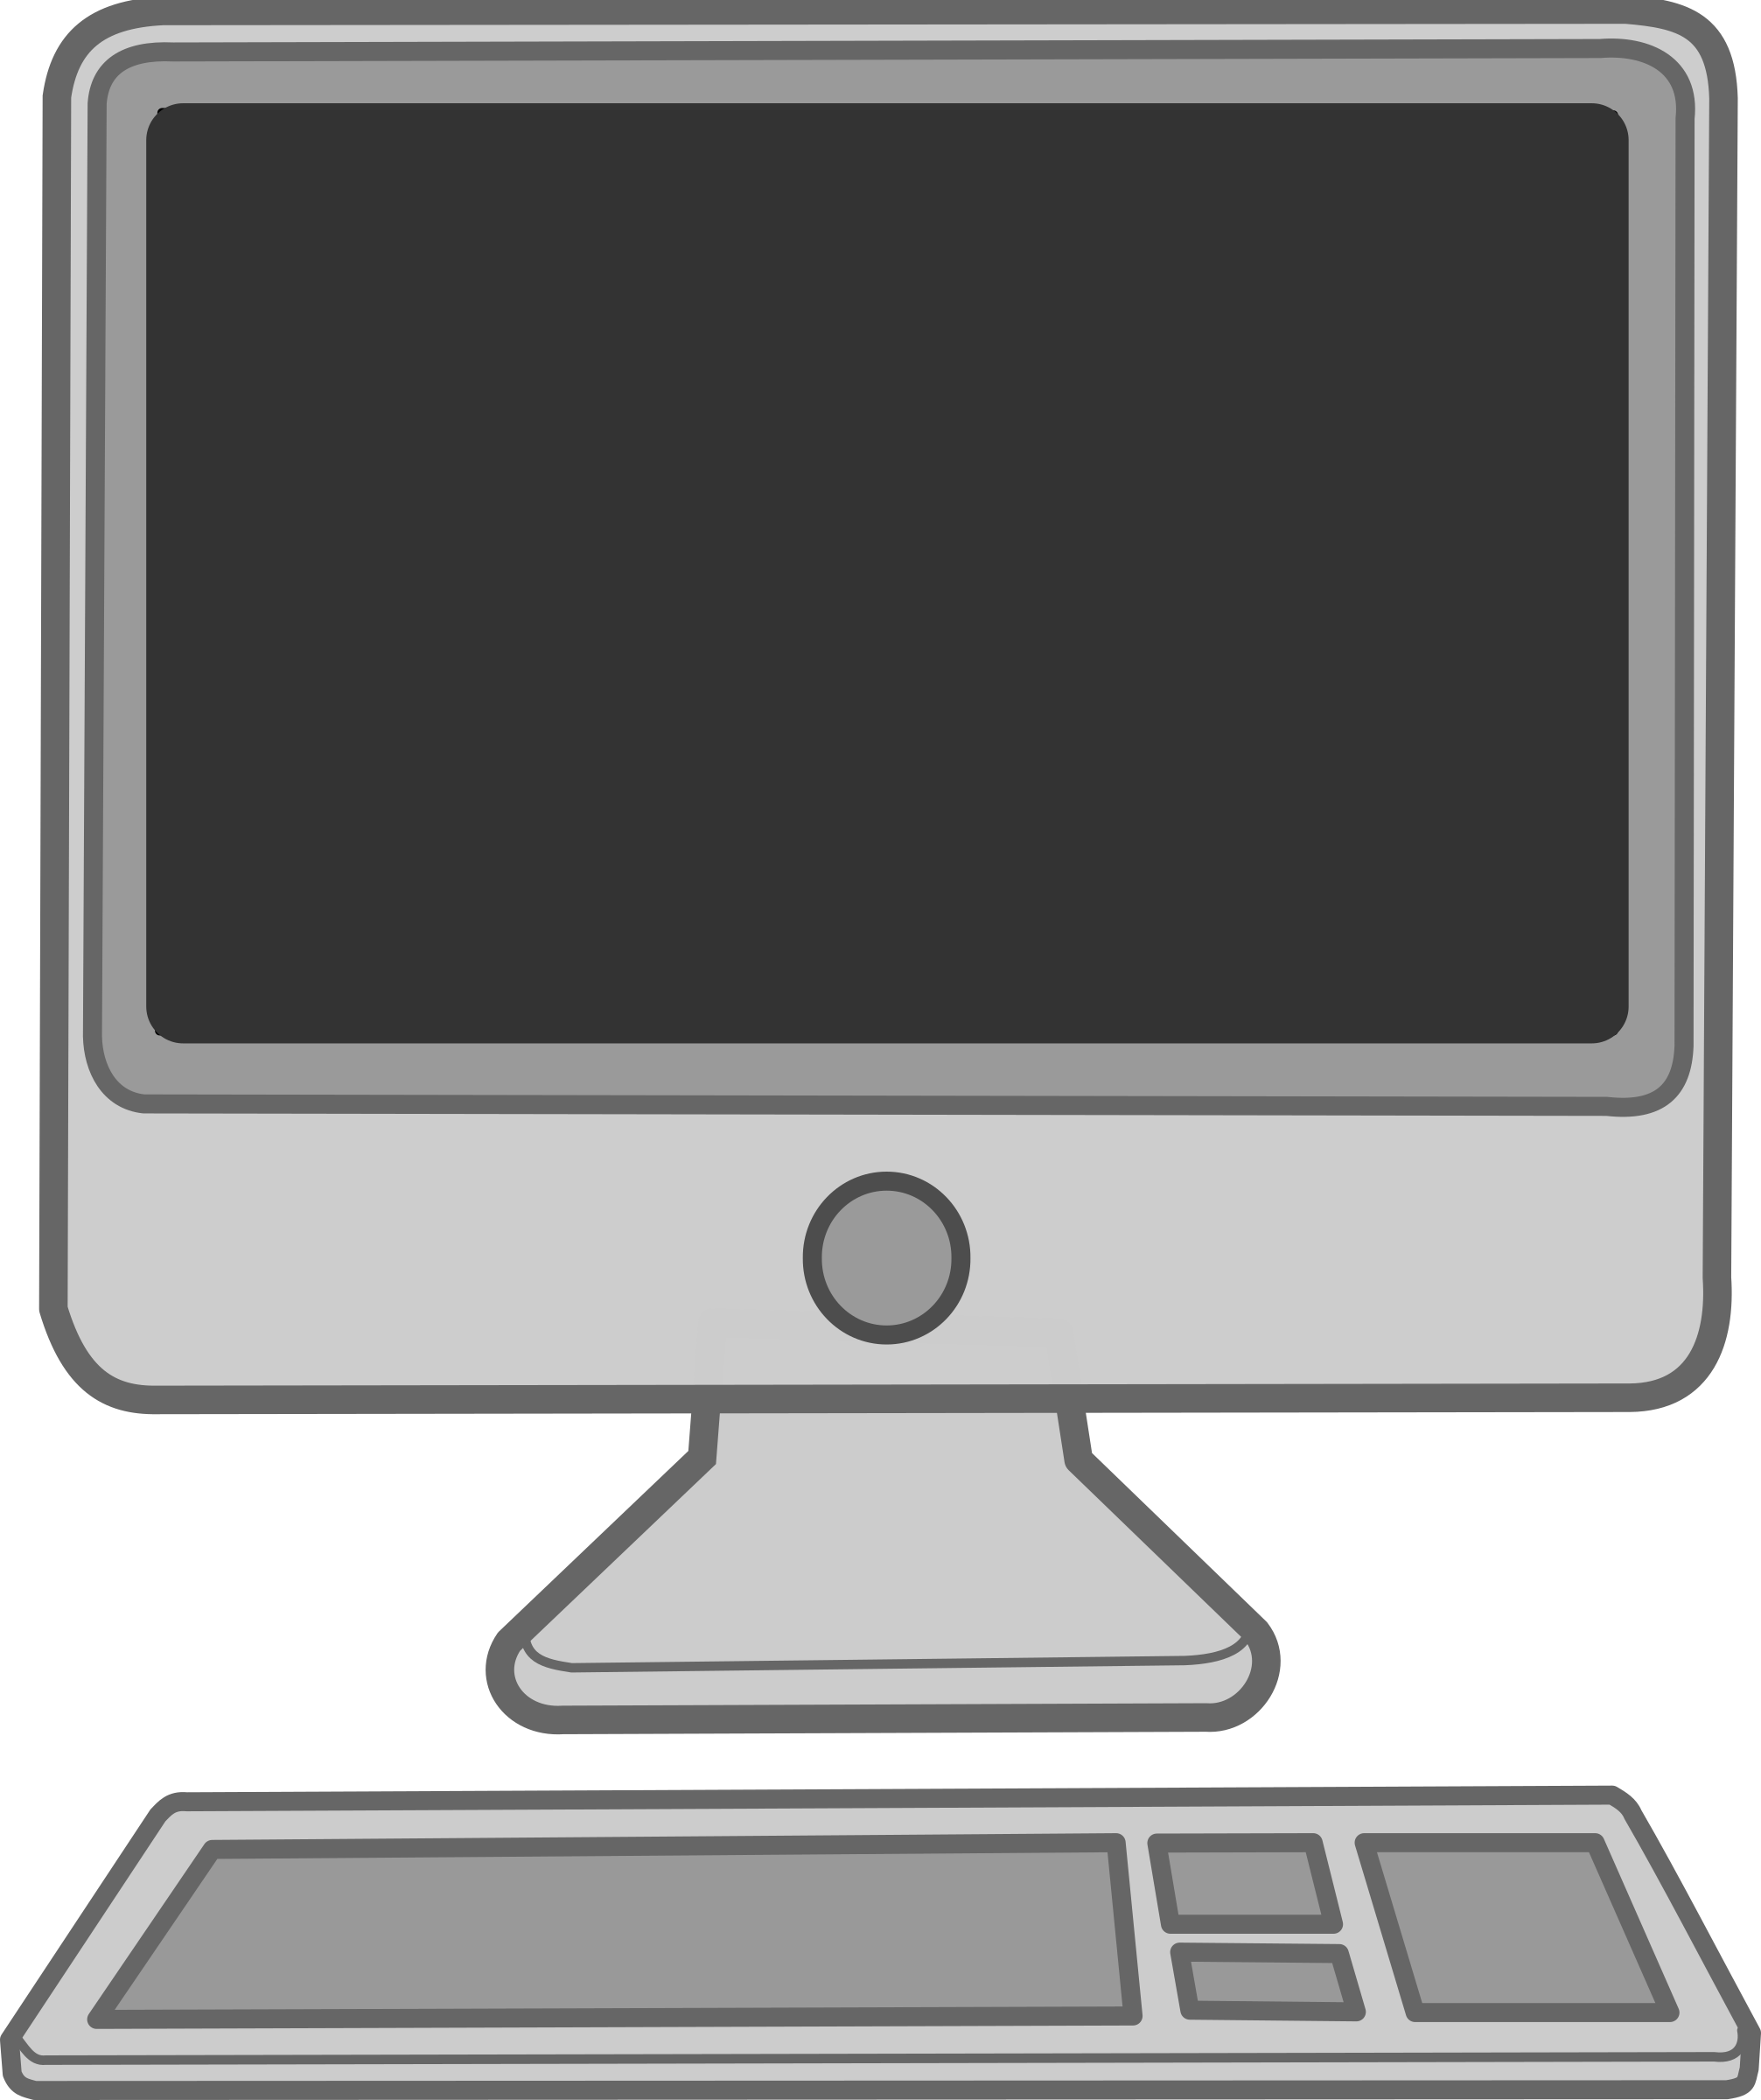 Computer Clipart #216 - Computer Images Clipart